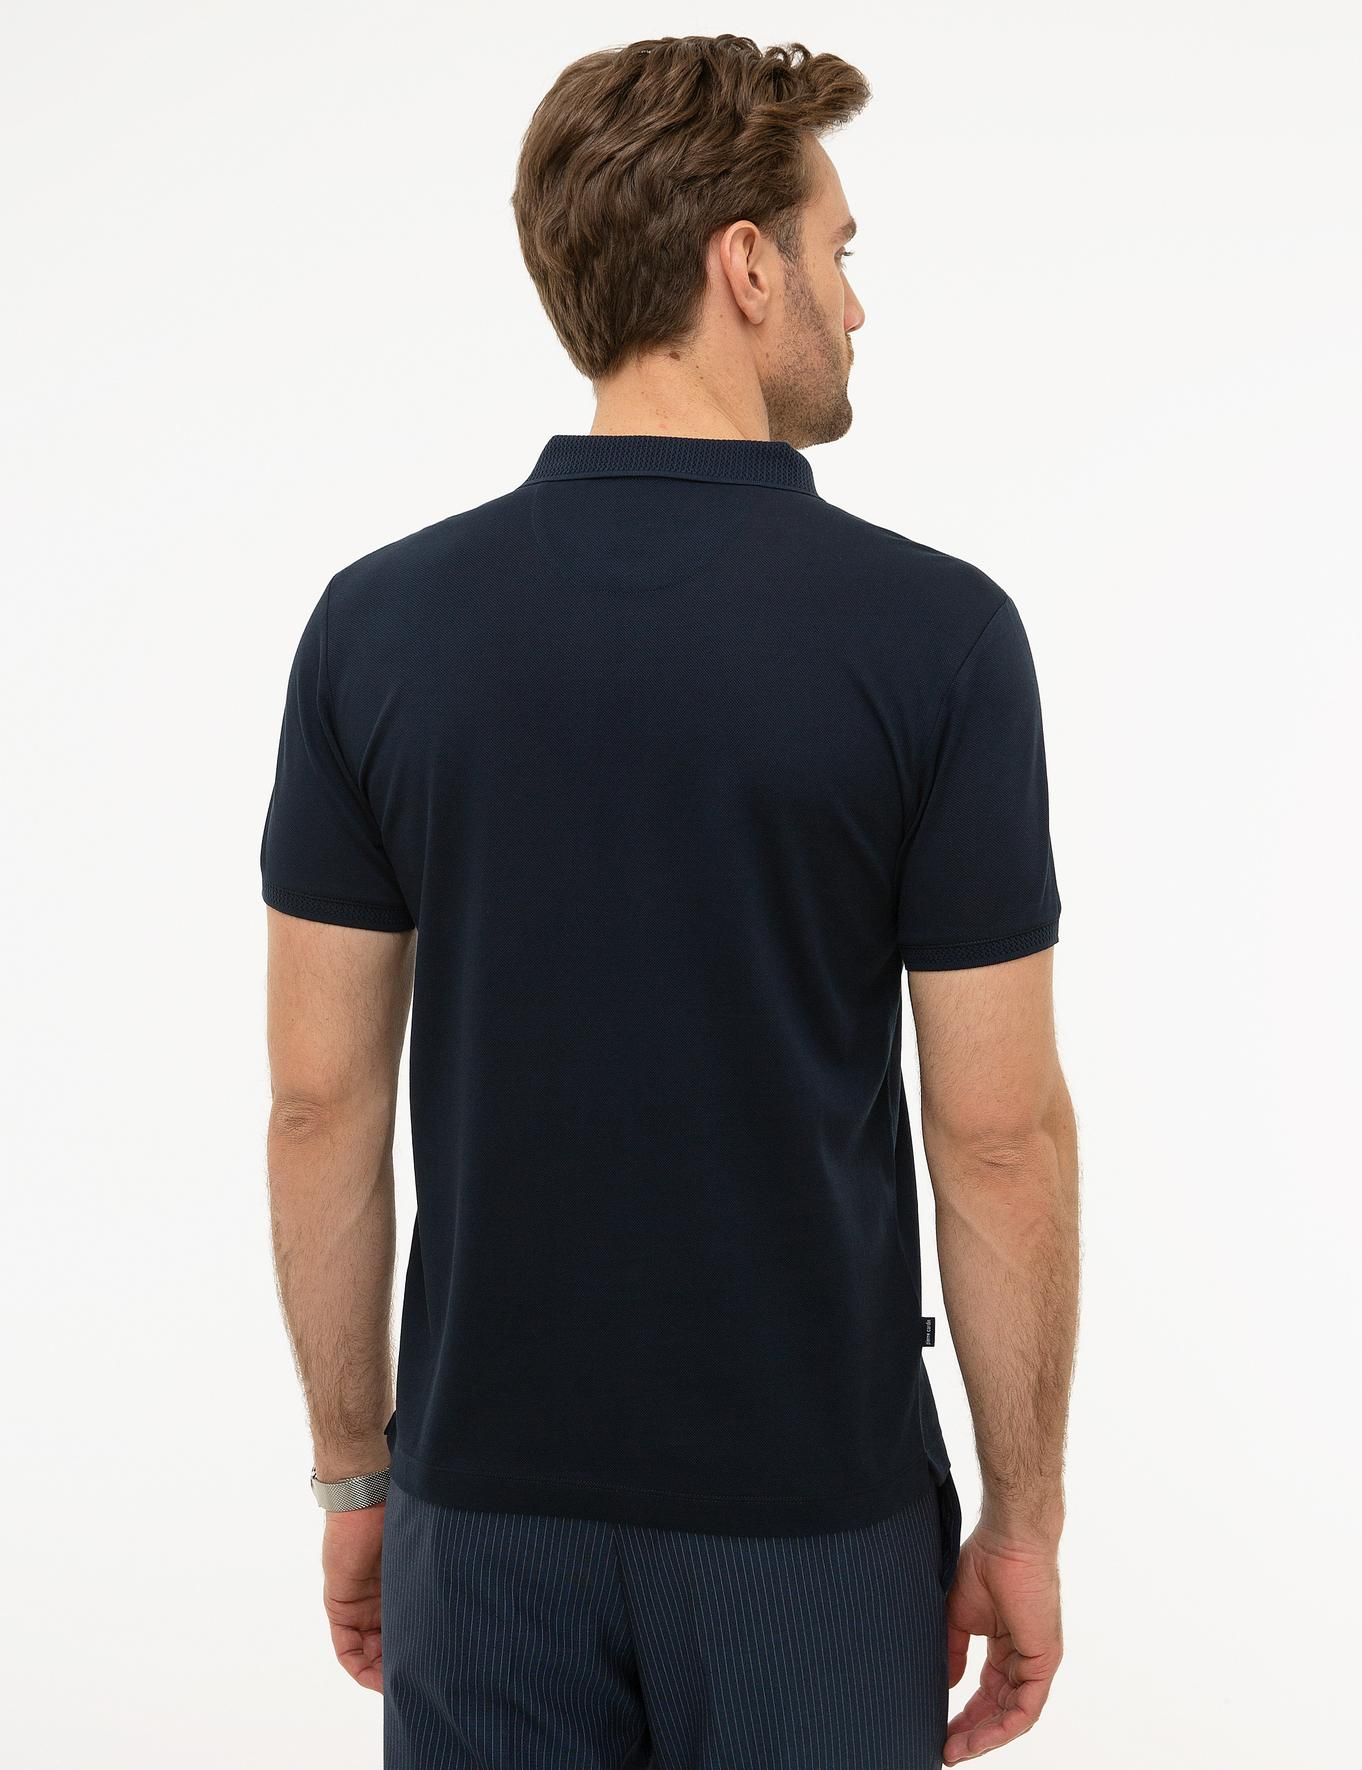 Koyu Lacivert Slim Fit Merserize T-Shirt